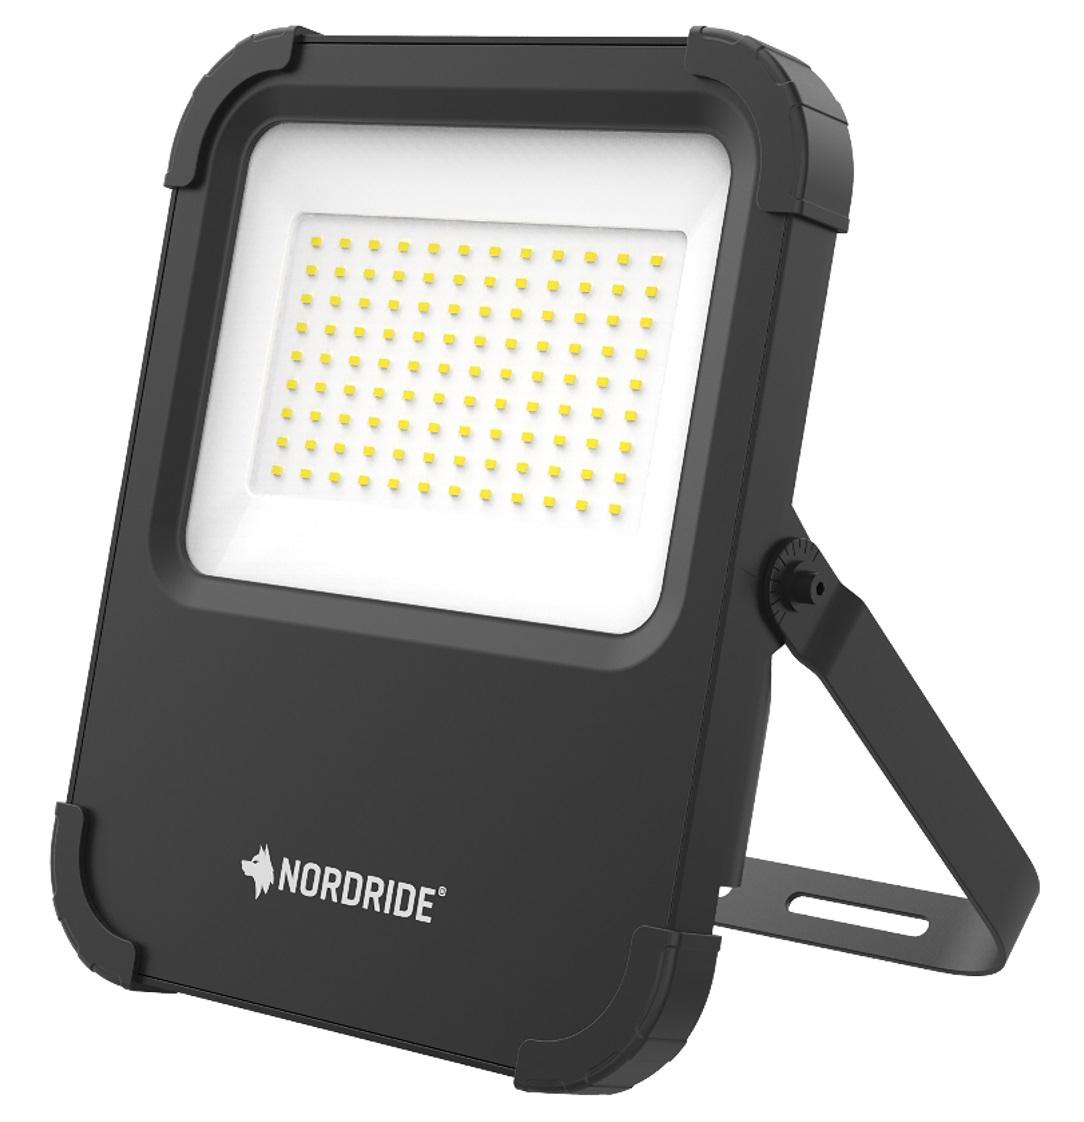 NORDRIDE 4090 VISTA SMD LED 100W_stehend